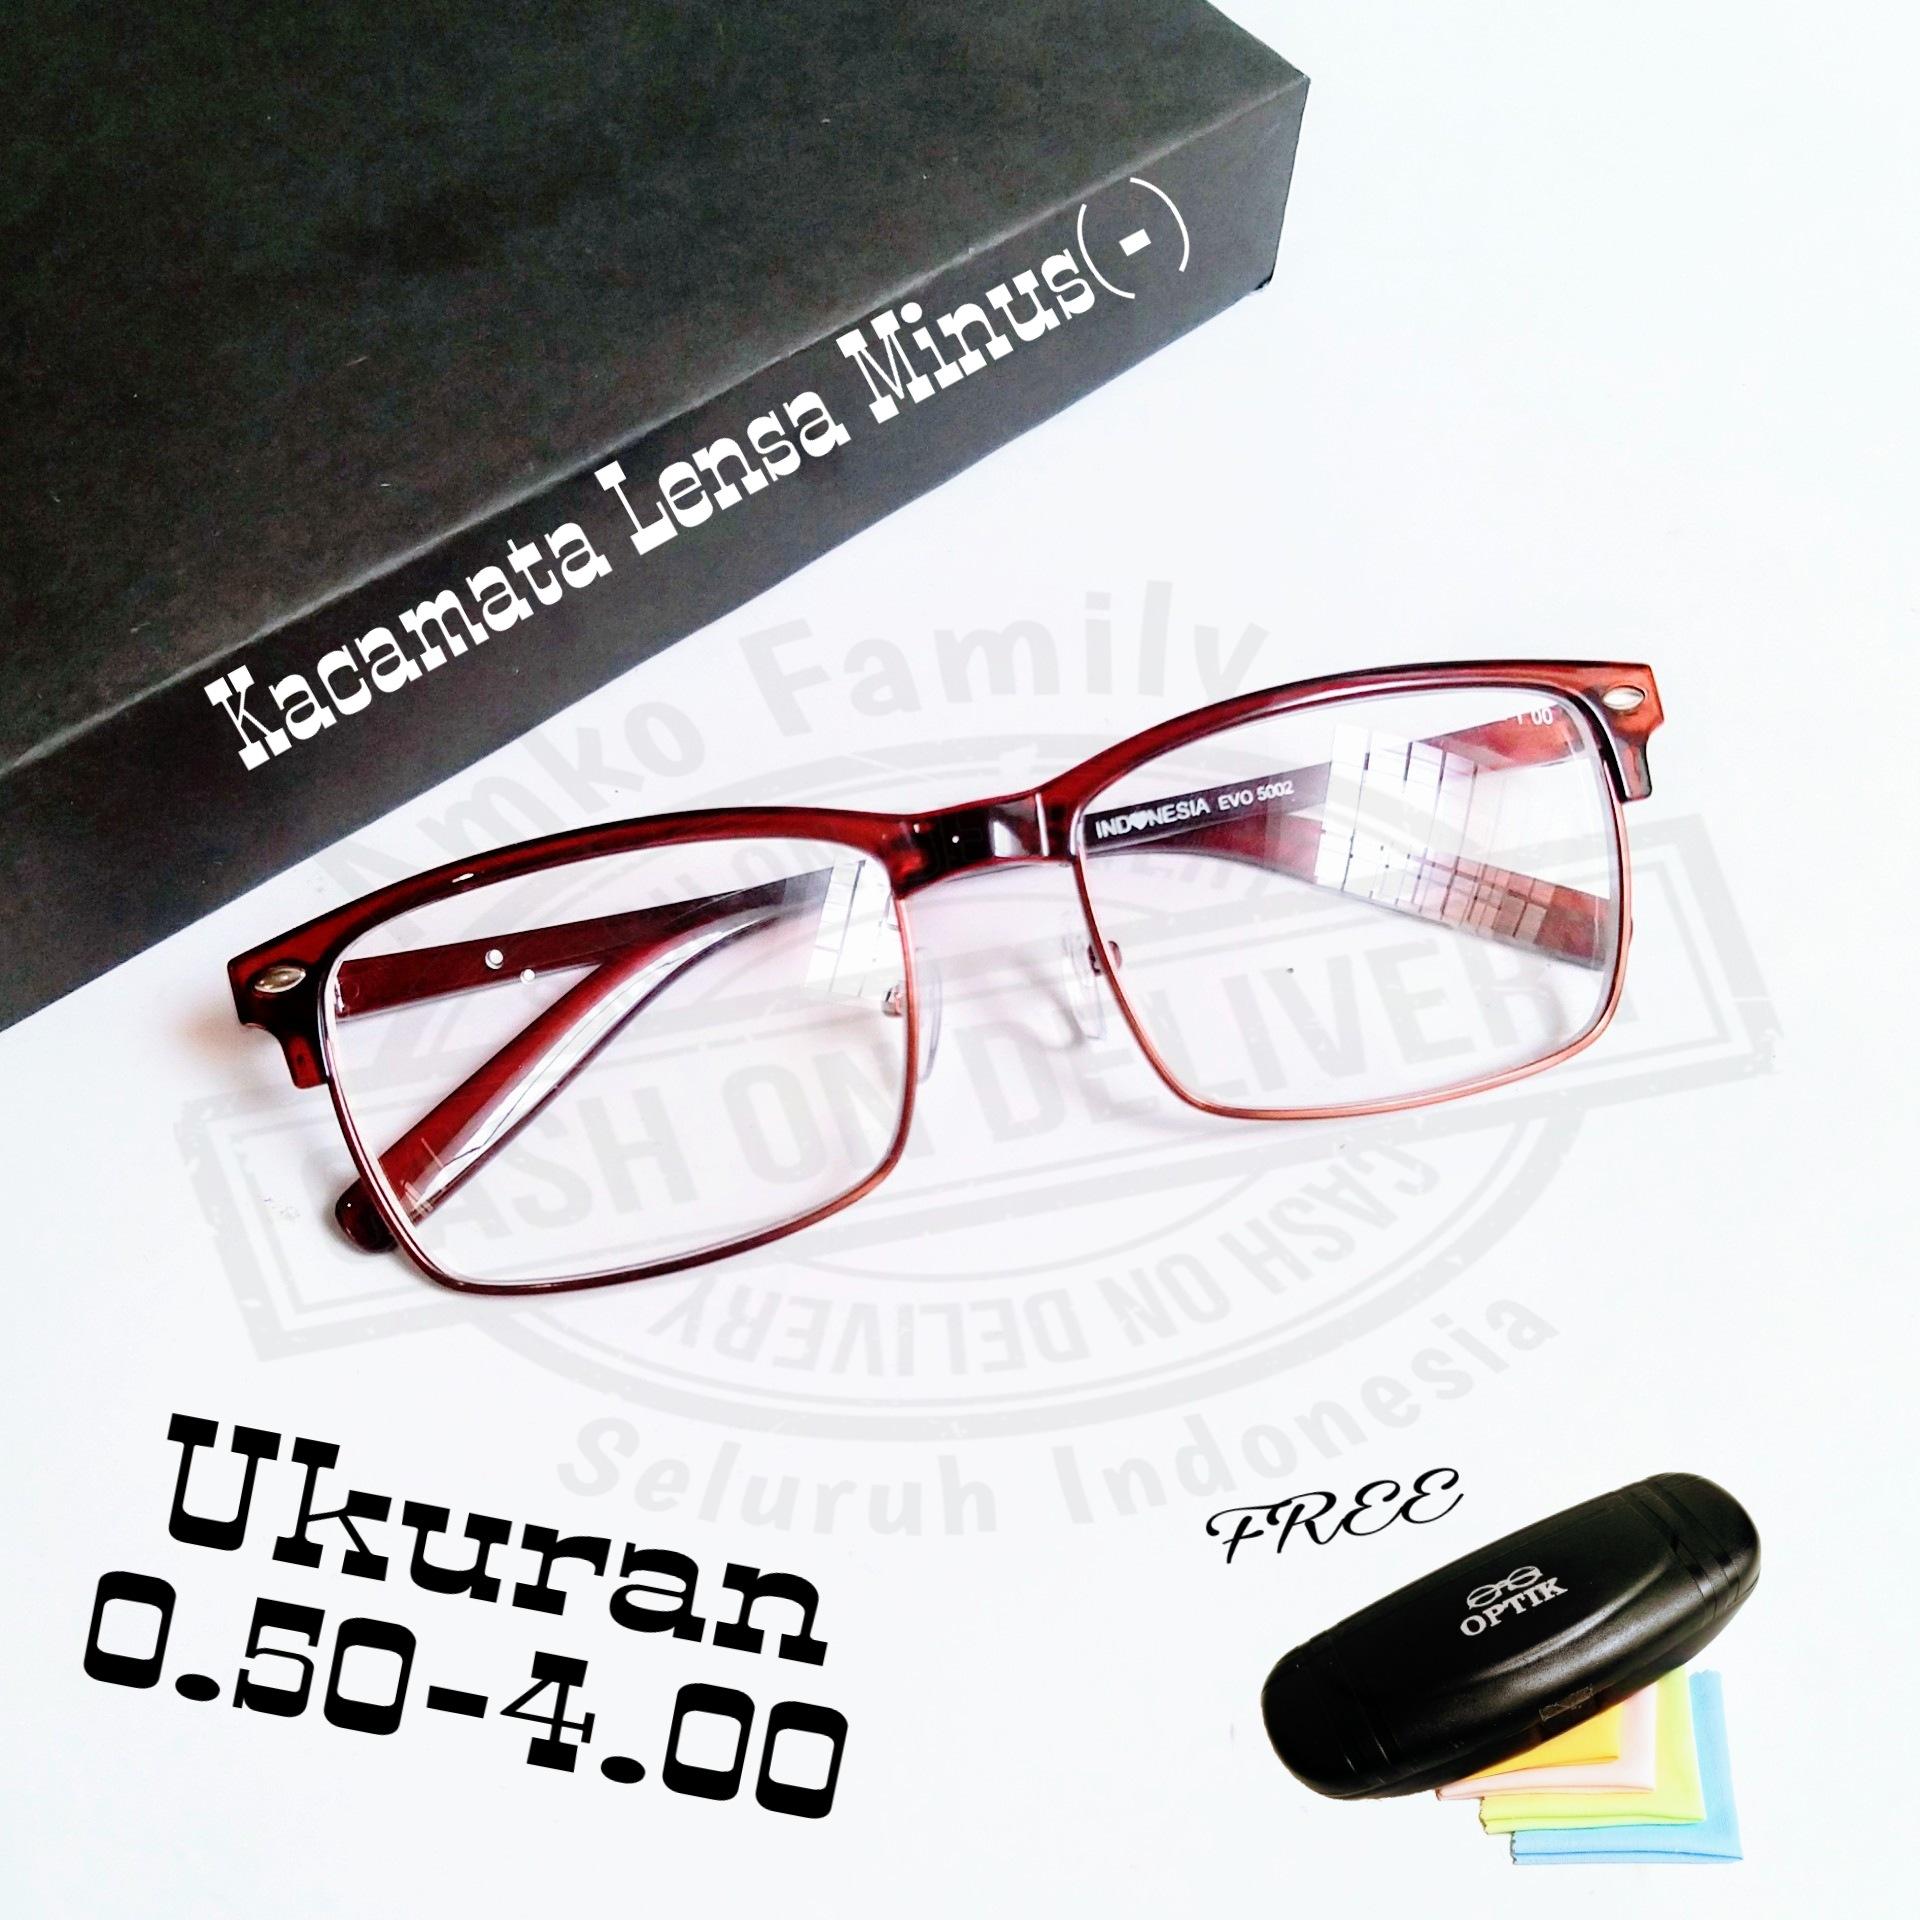 kacamata minus model kotak ukuran 0.50/4.00 free box lap pembersih sunglasses vintage new